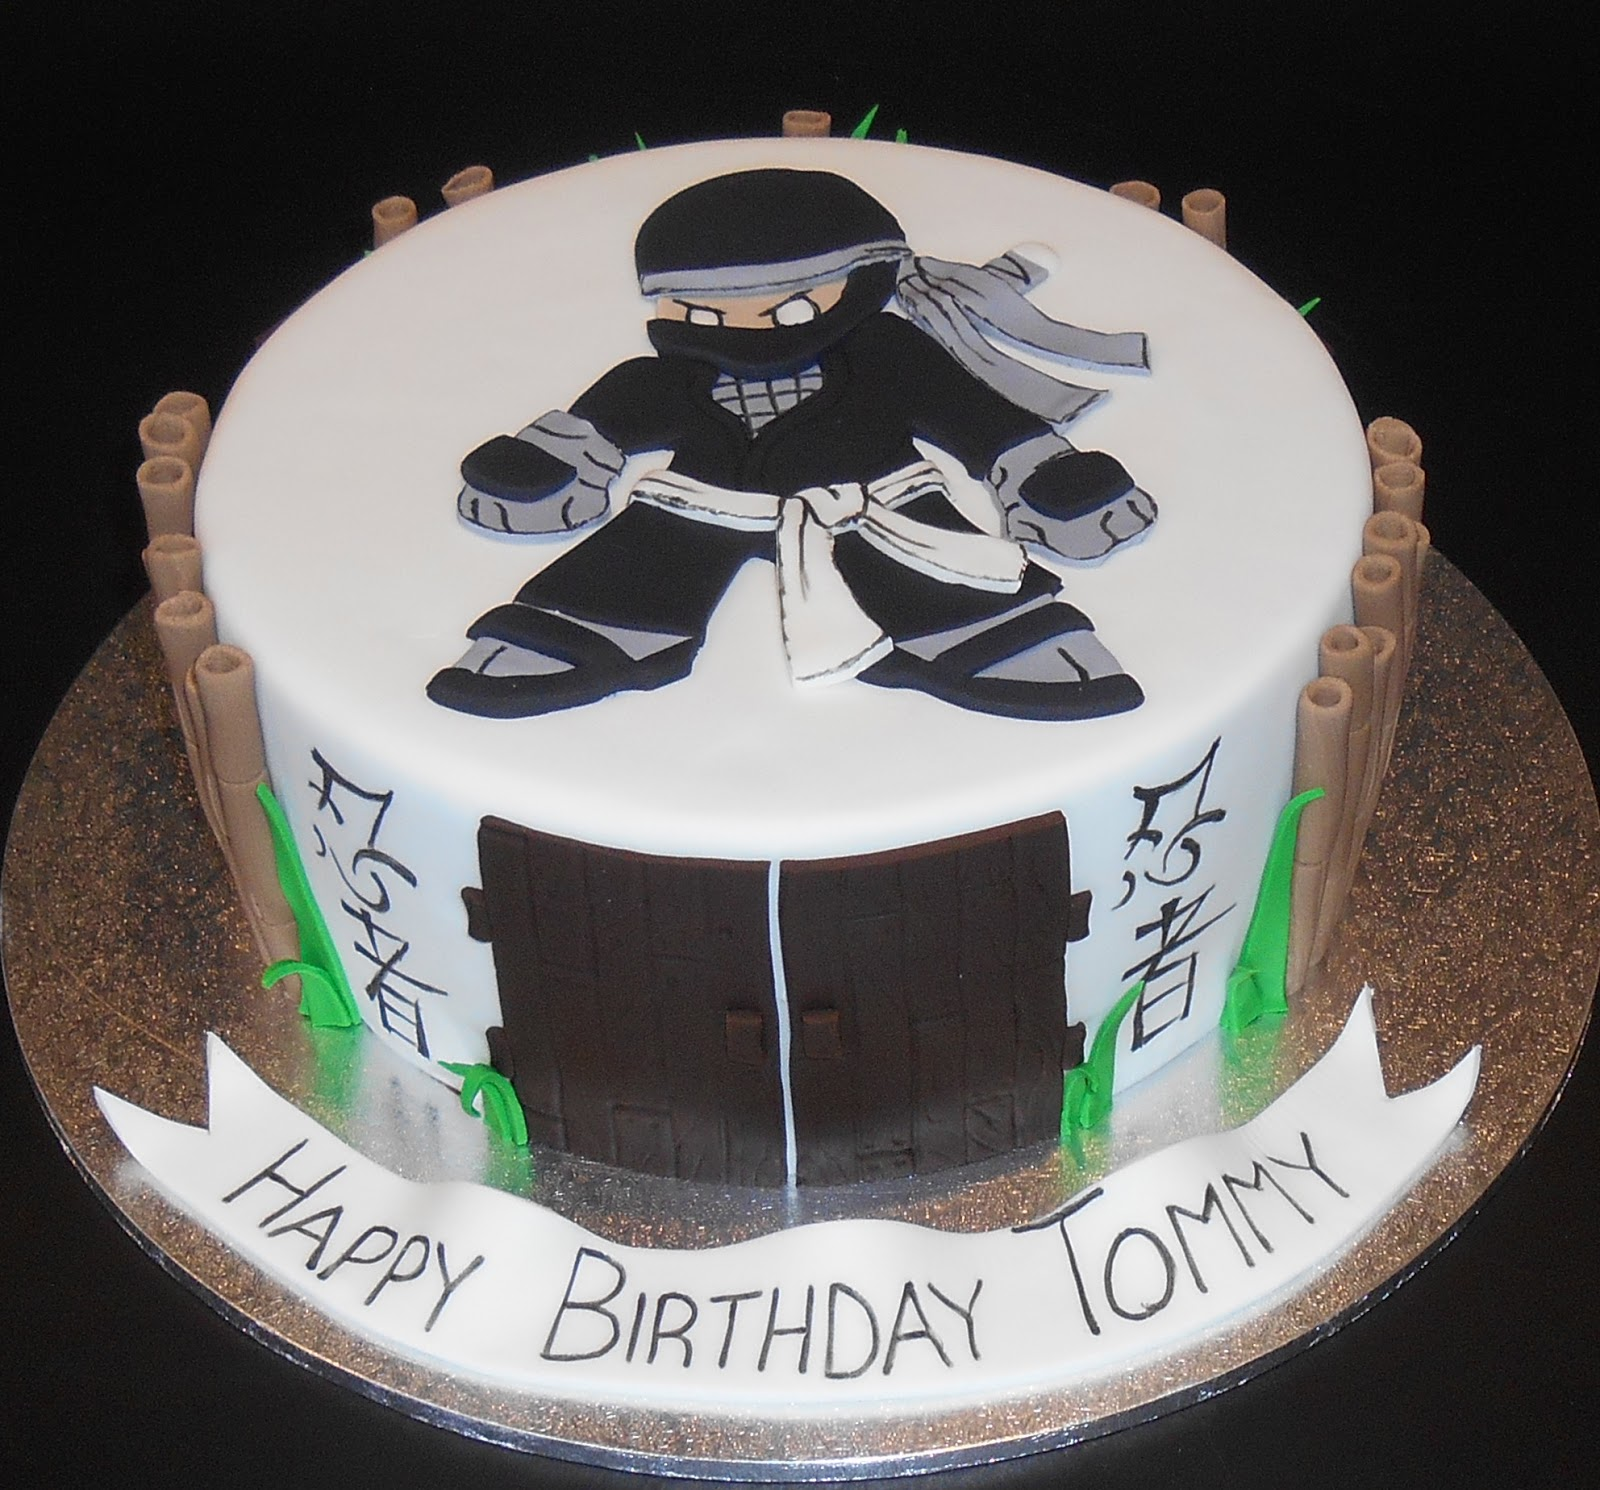 Nadas Cakes Ninja Birthday Cake By Nadas Cakes Canberra